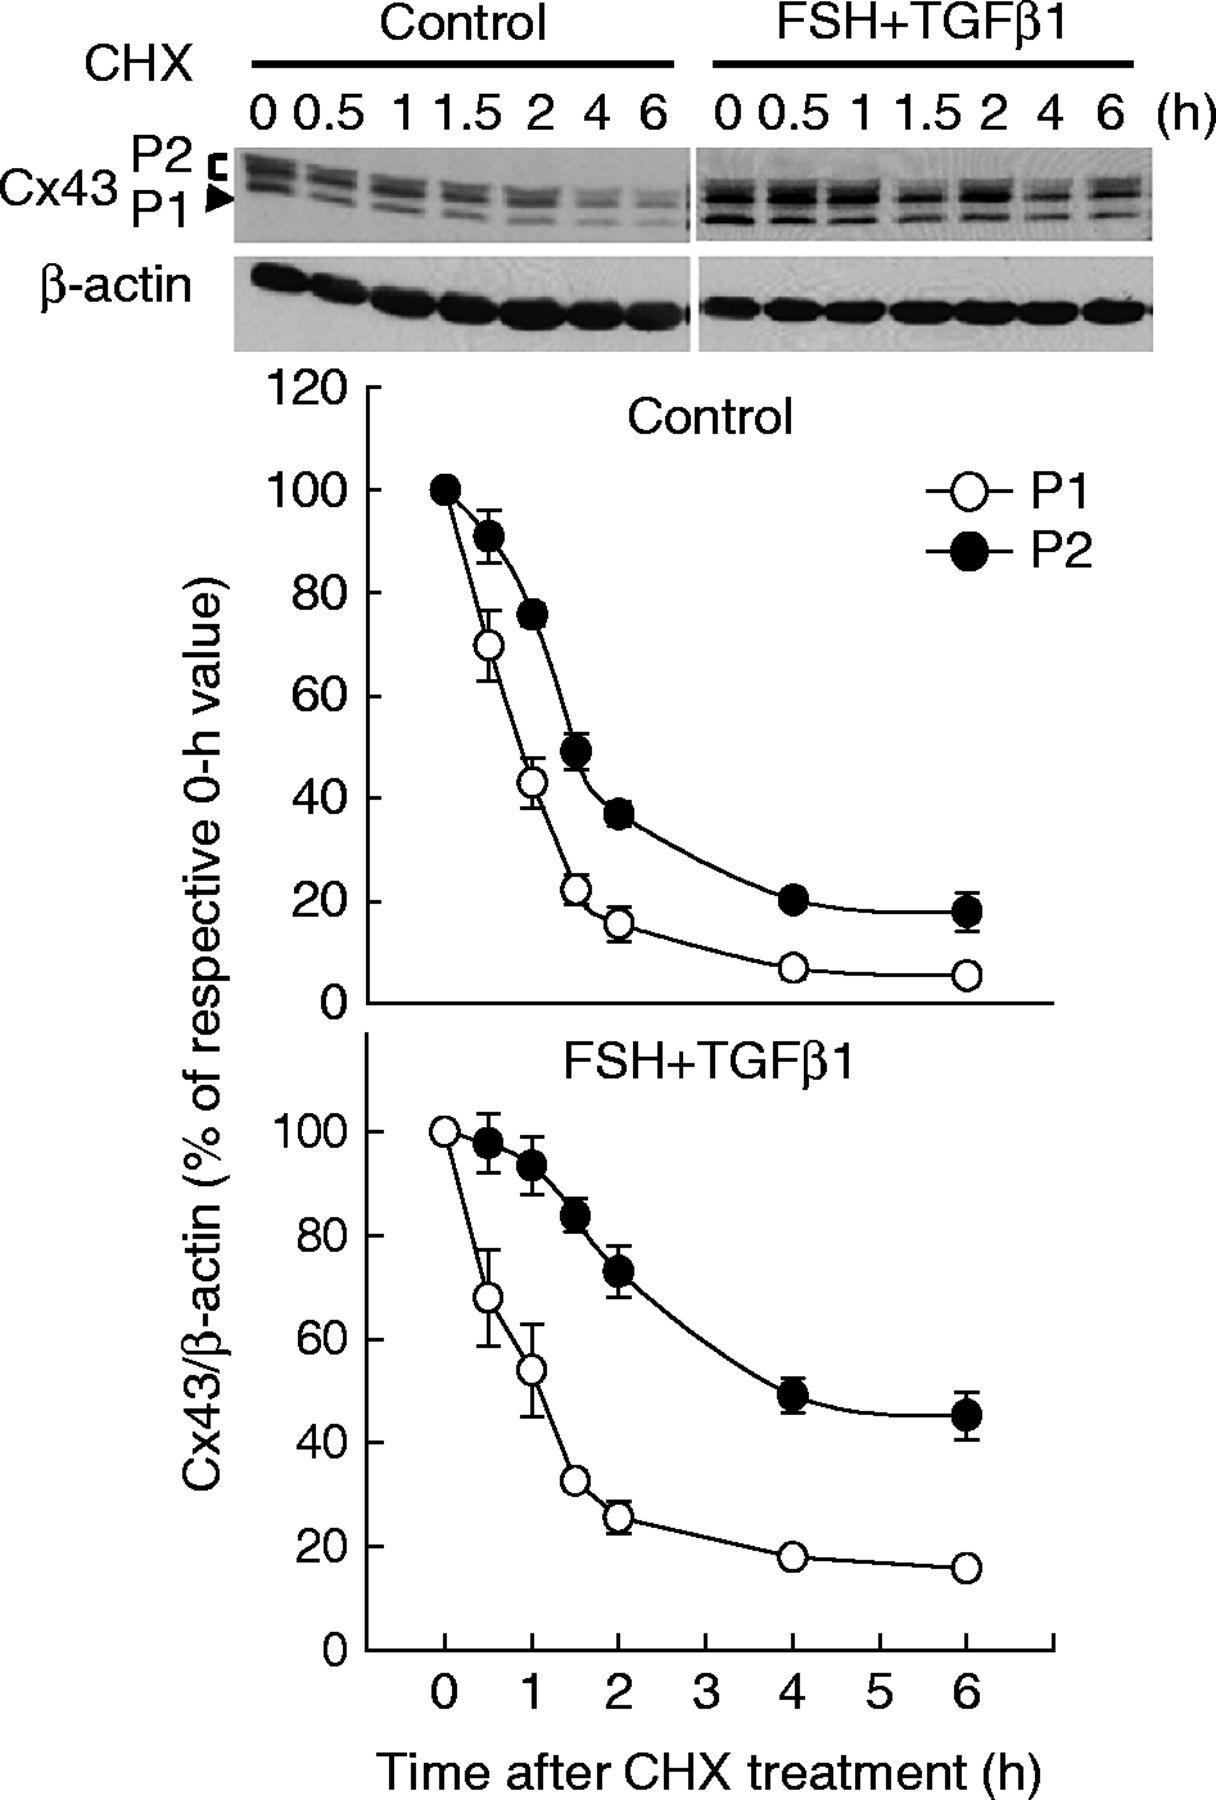 Crtc2 And Nedd4 Ligase Involvement In Fsh Tgf1 Upregulation Of H 263 Block Diagram Figure 5